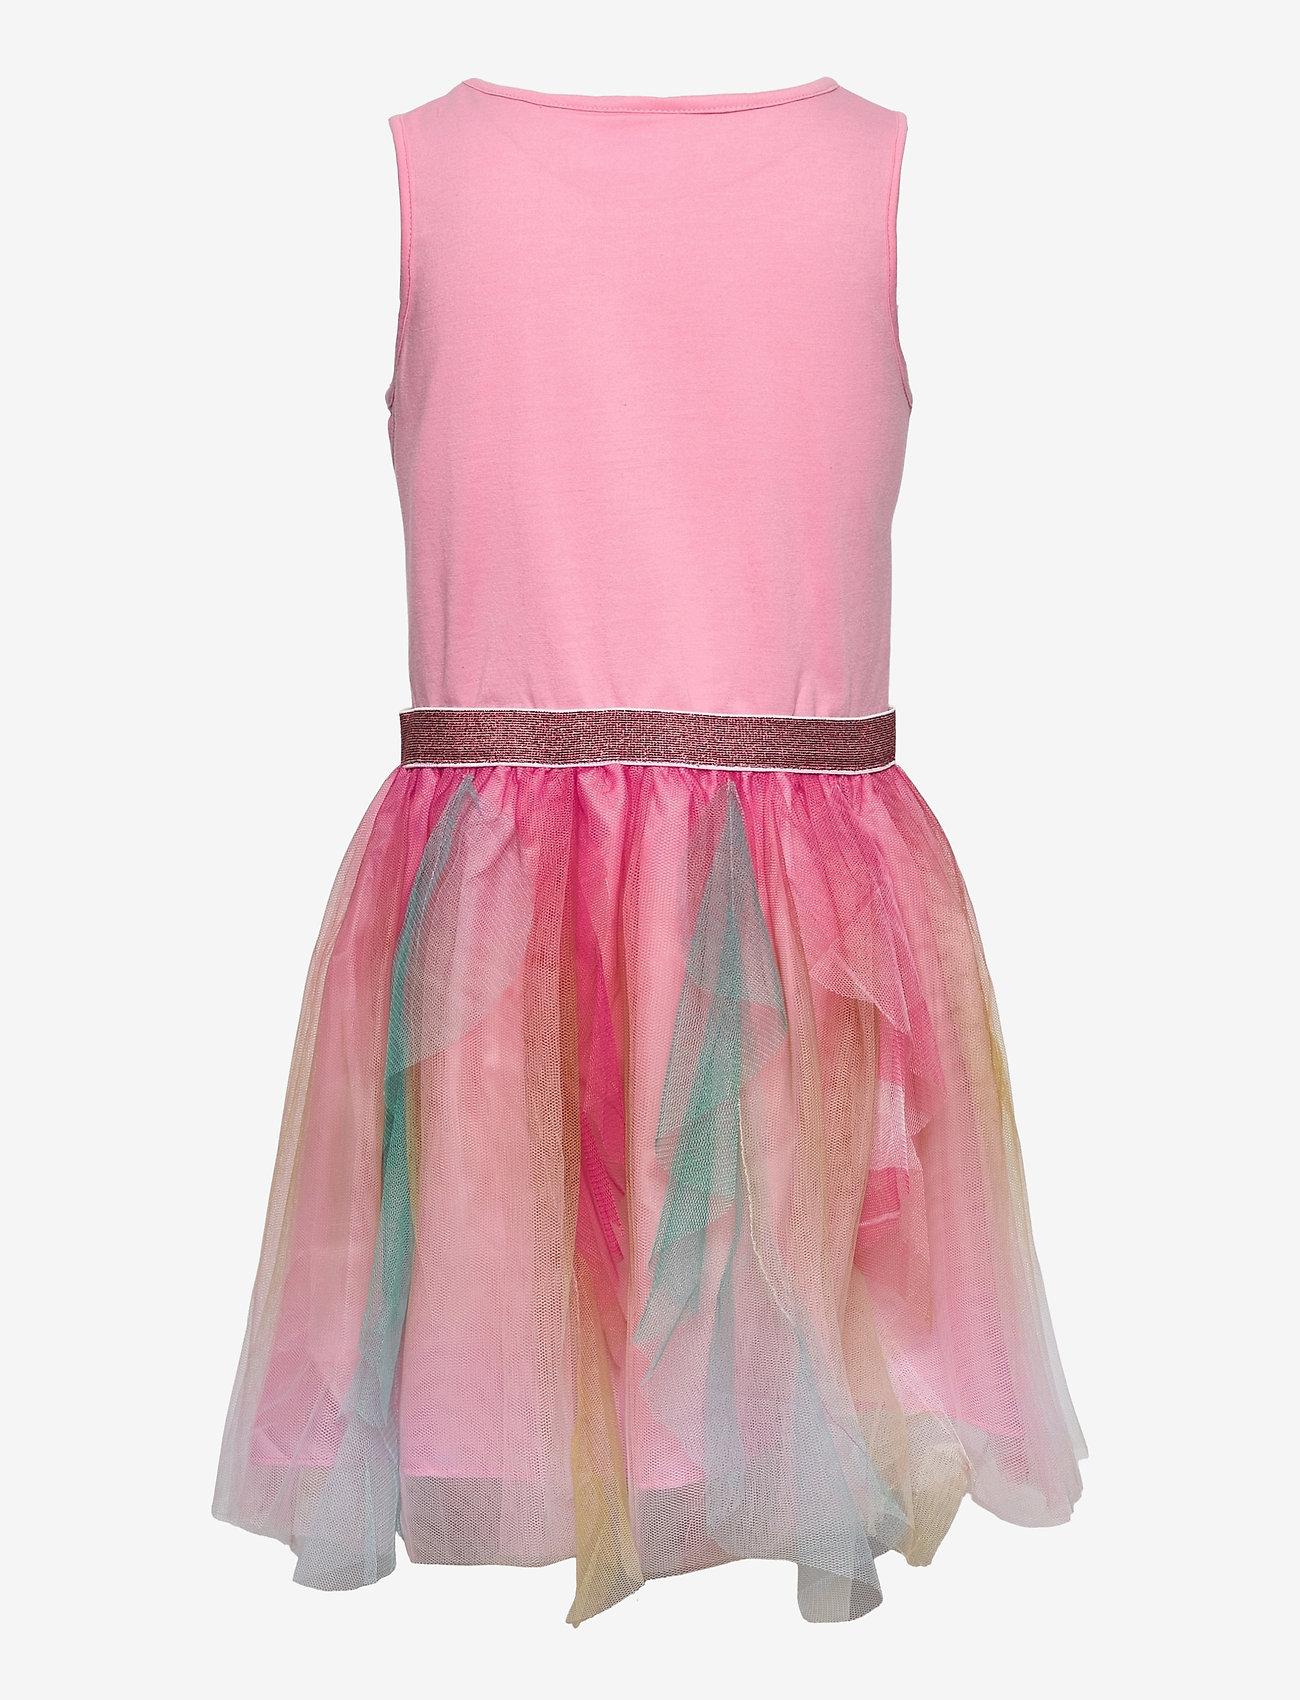 L.O.L - DRESS S/M RUFFLED SKIRT MULTI CO - kleider - pink - 1